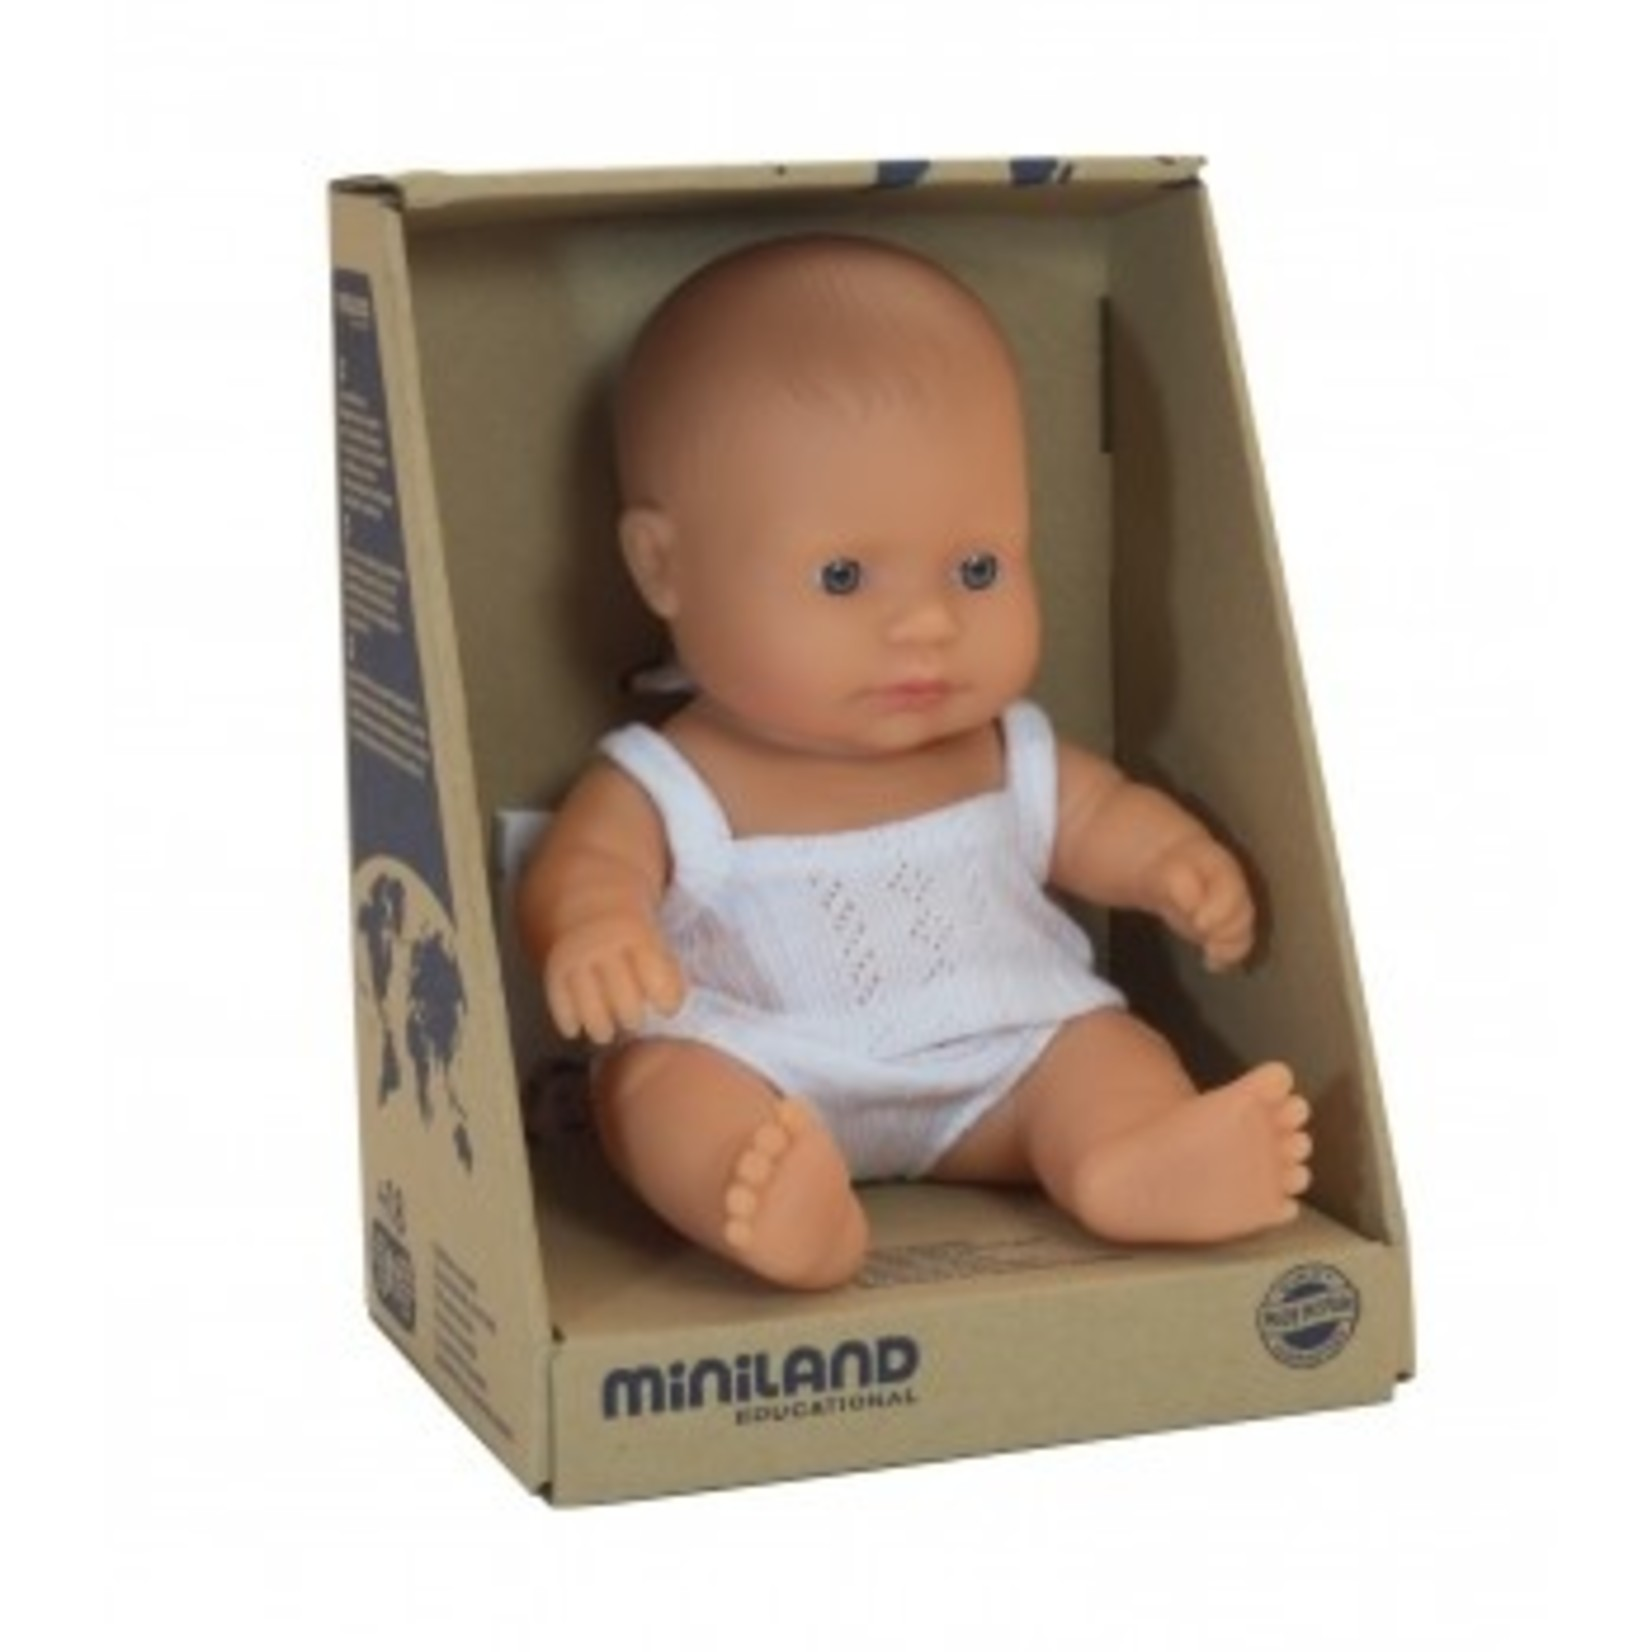 Miniland Miniland 21 cm Caucasian Doll